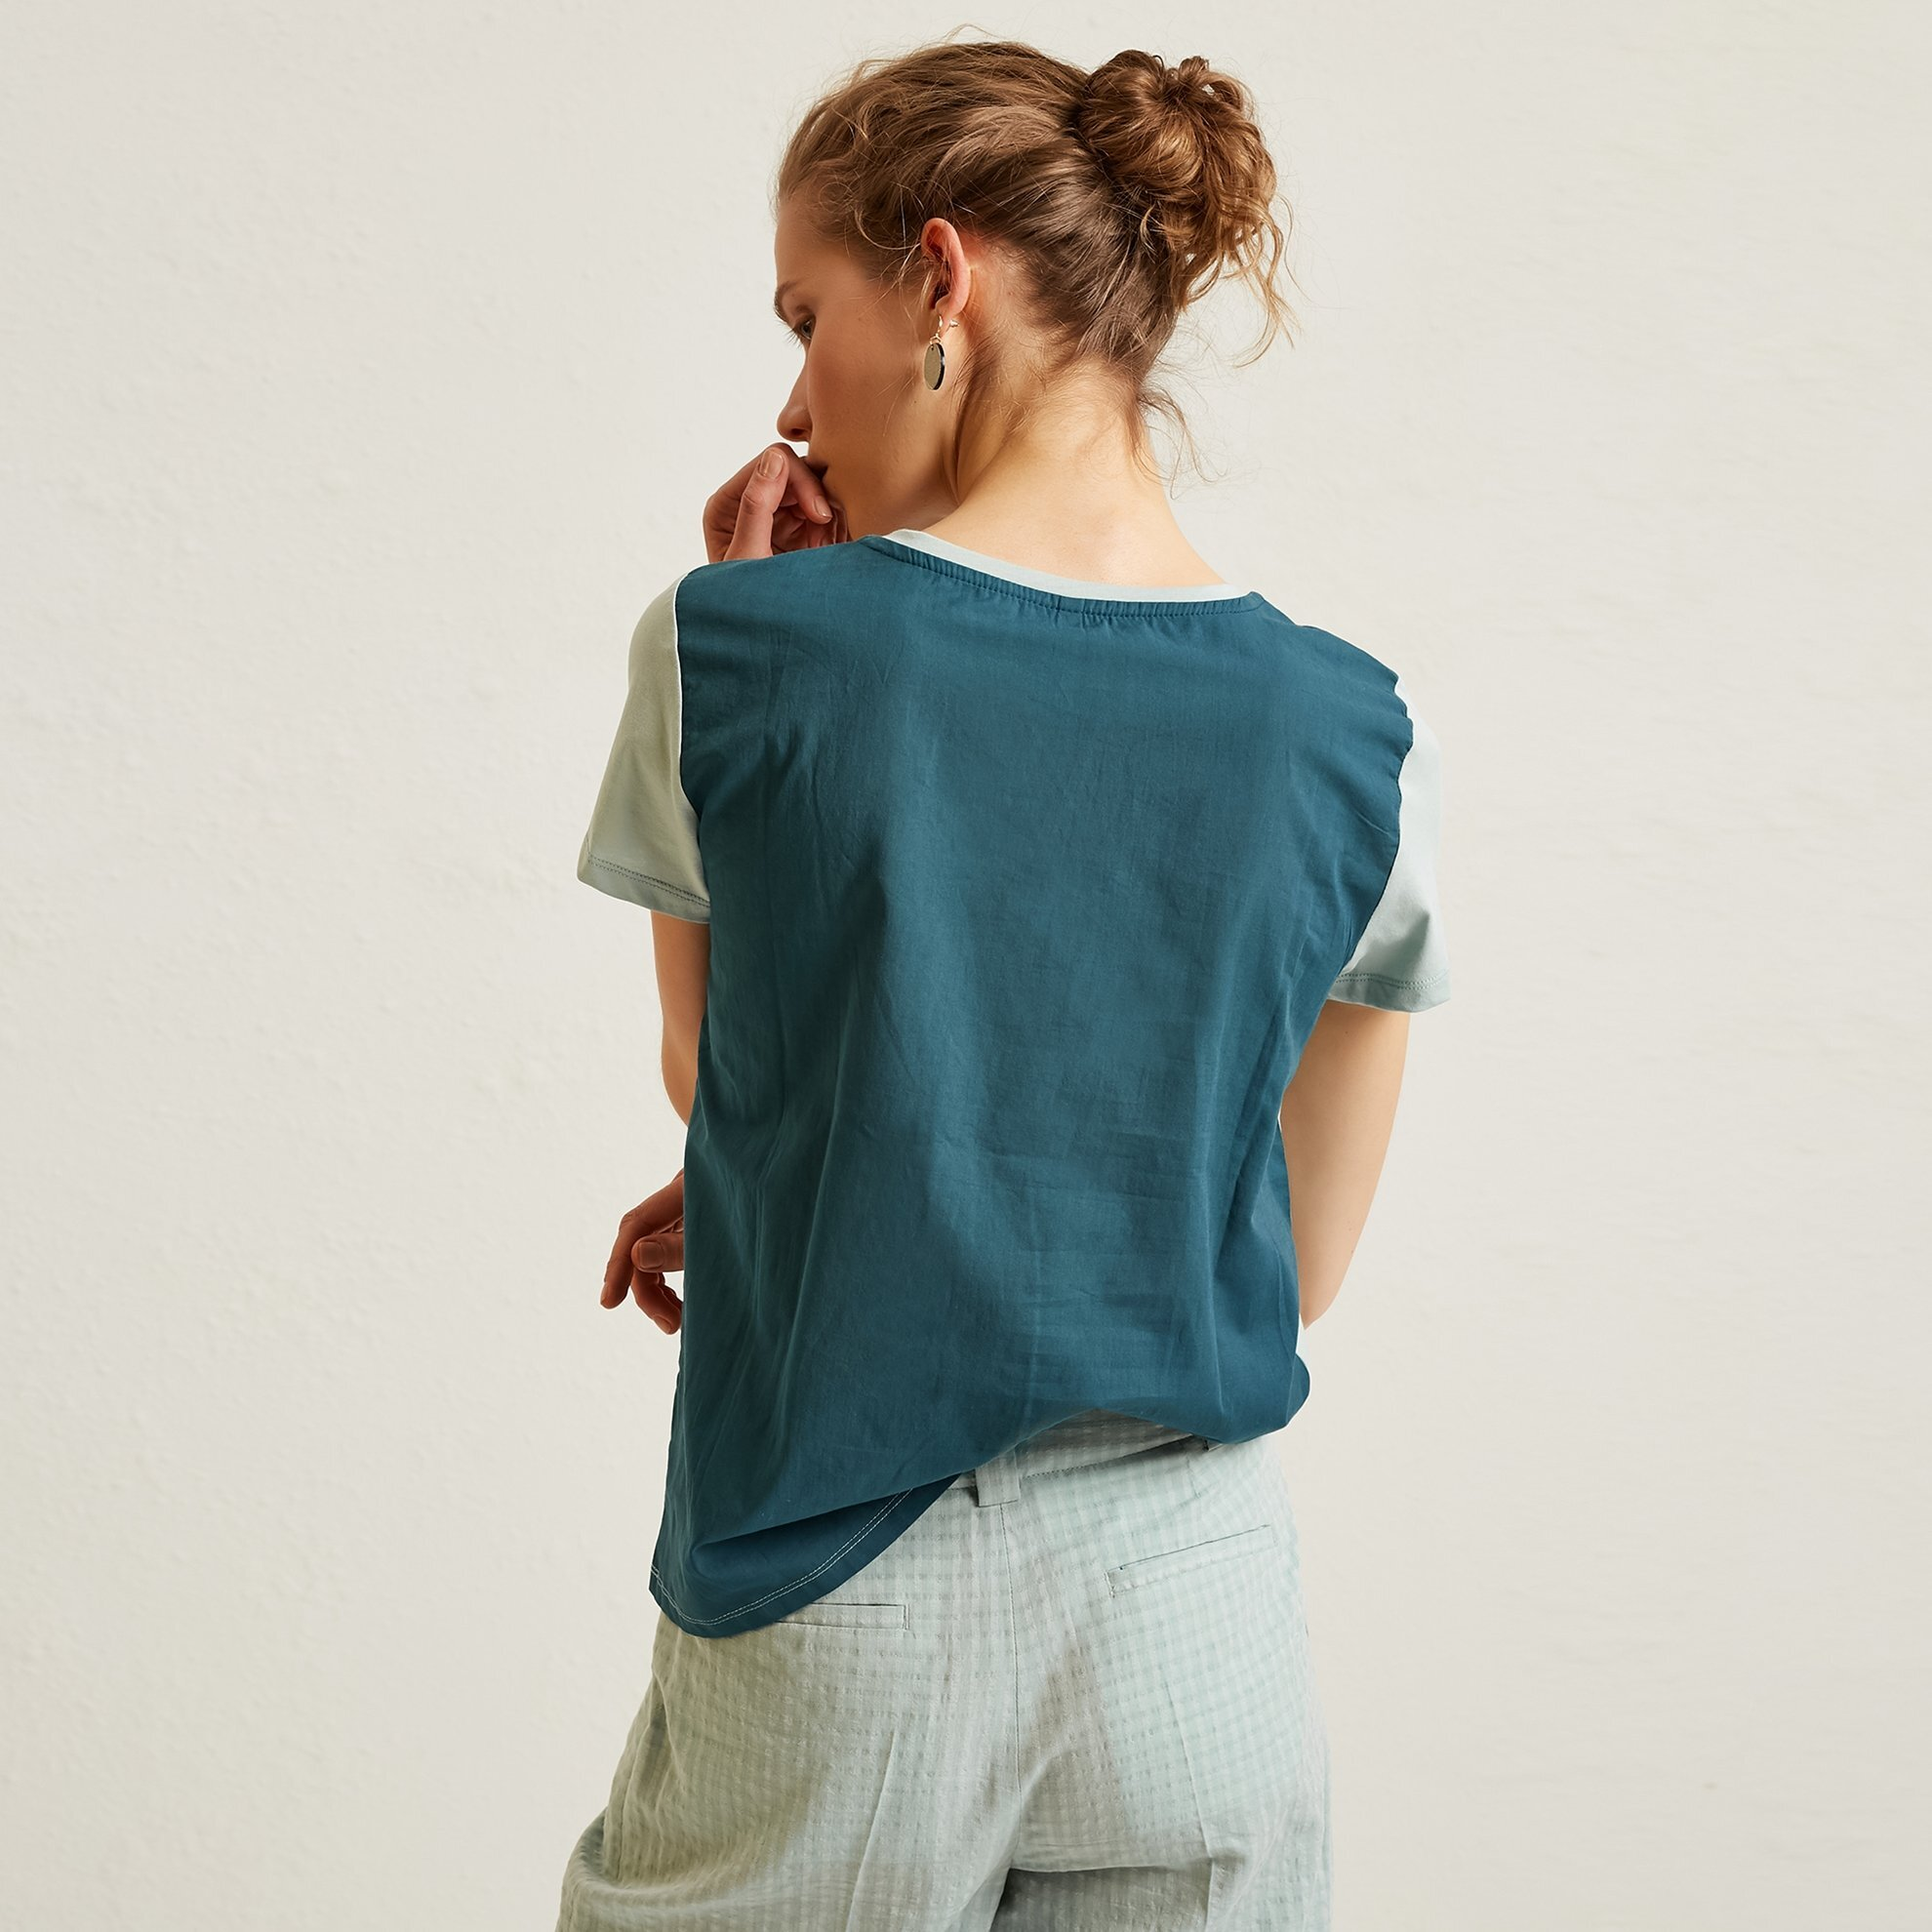 Contrast Binding Detailed Printed T-Shirt